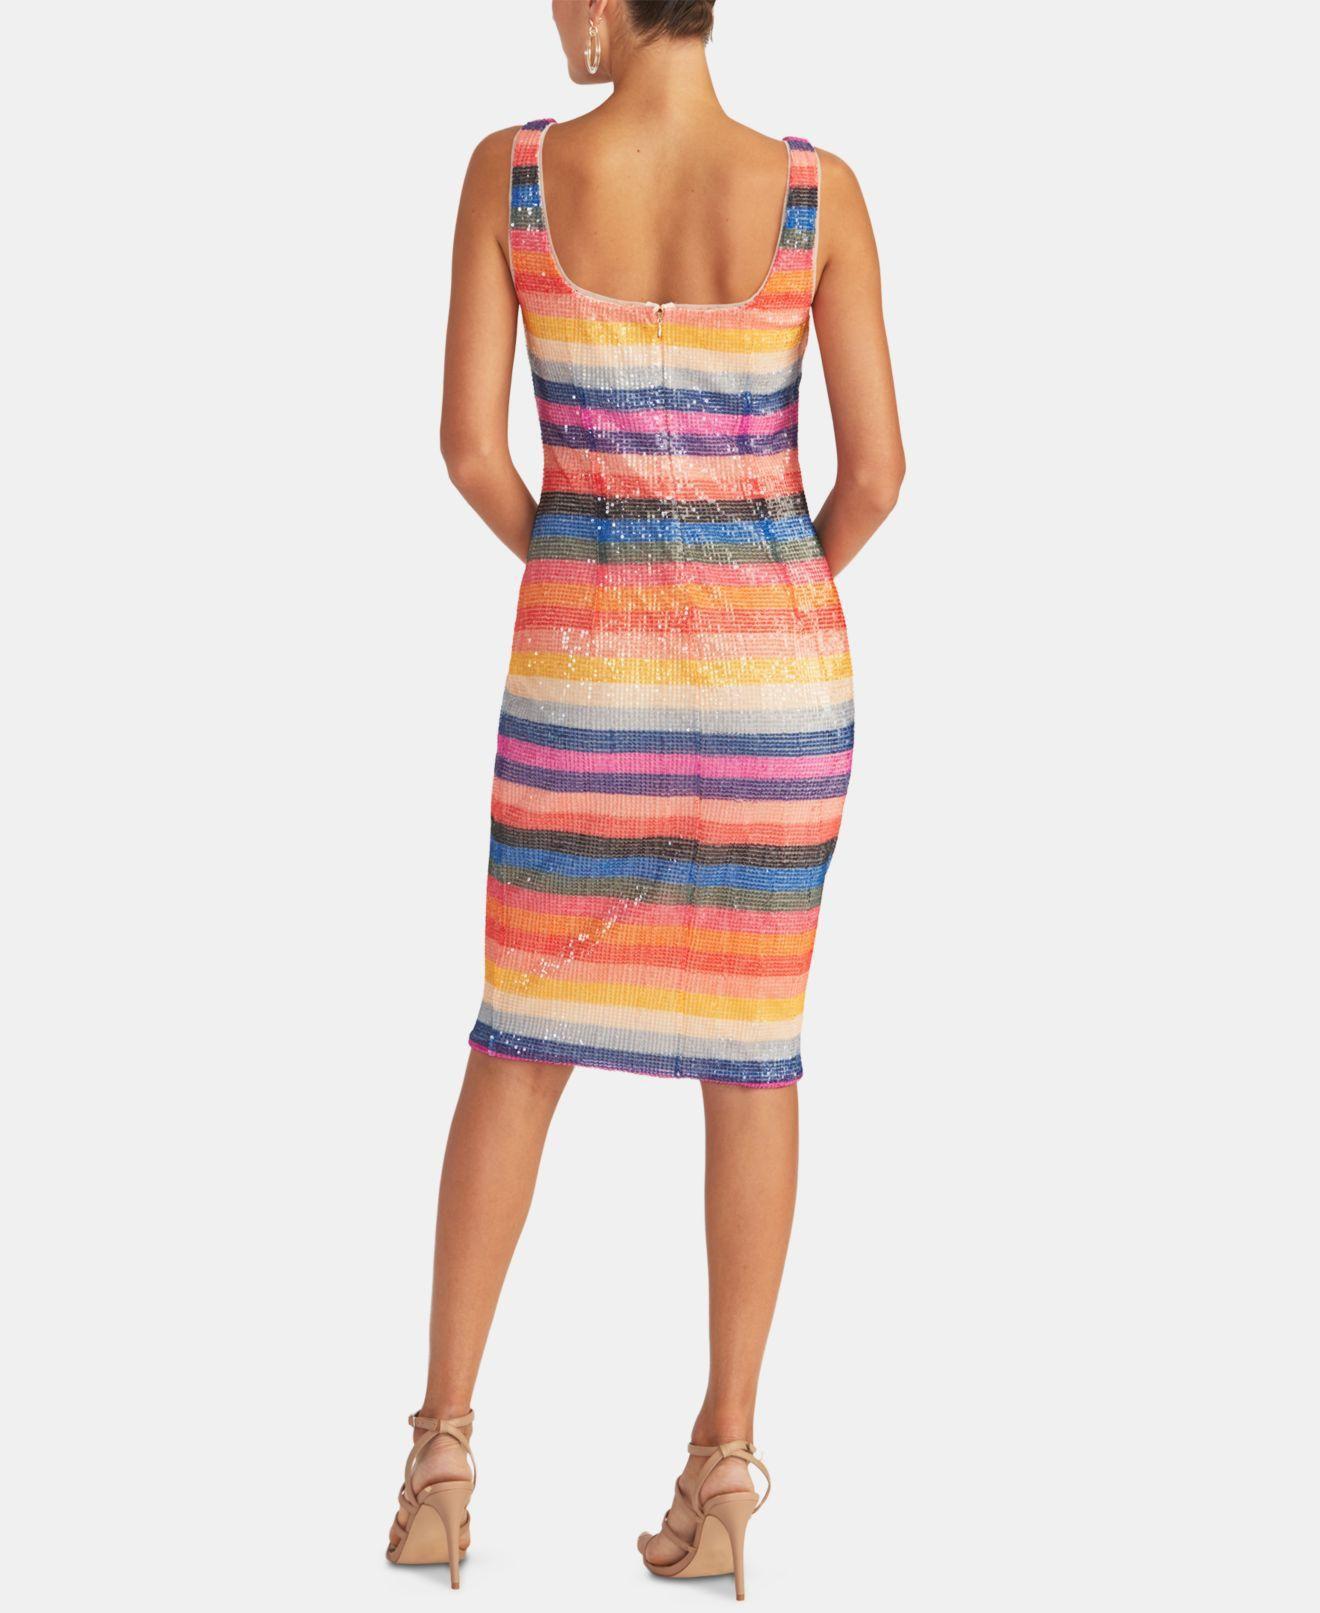 Rachel Rachel Roy Women's Dress Blue Size XL Tank Sequined Sheath